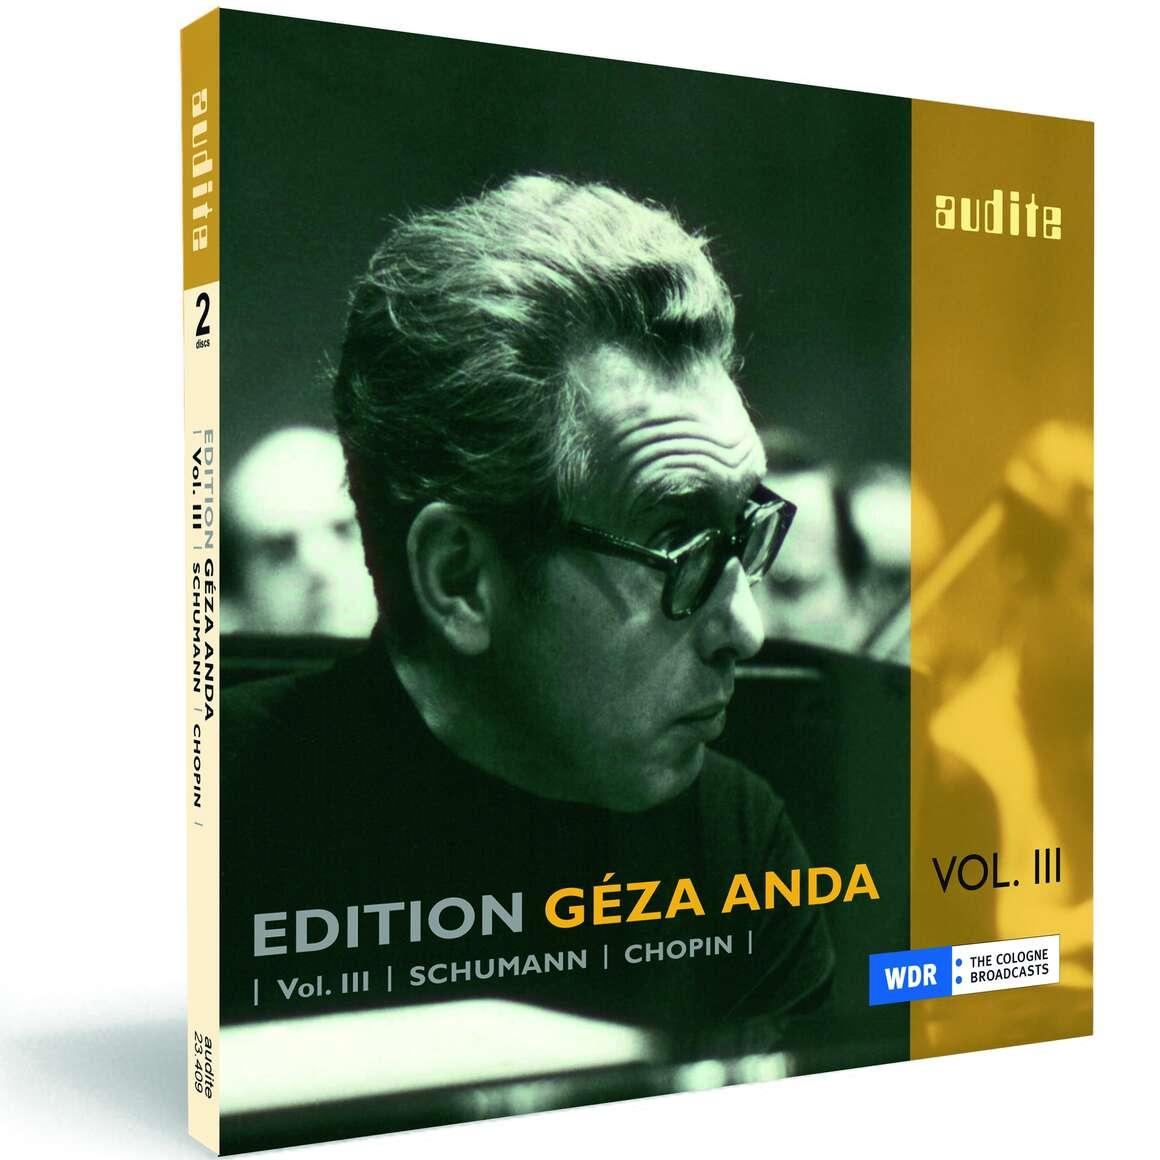 Edition Géza Anda (III) – Schumann | Chopin